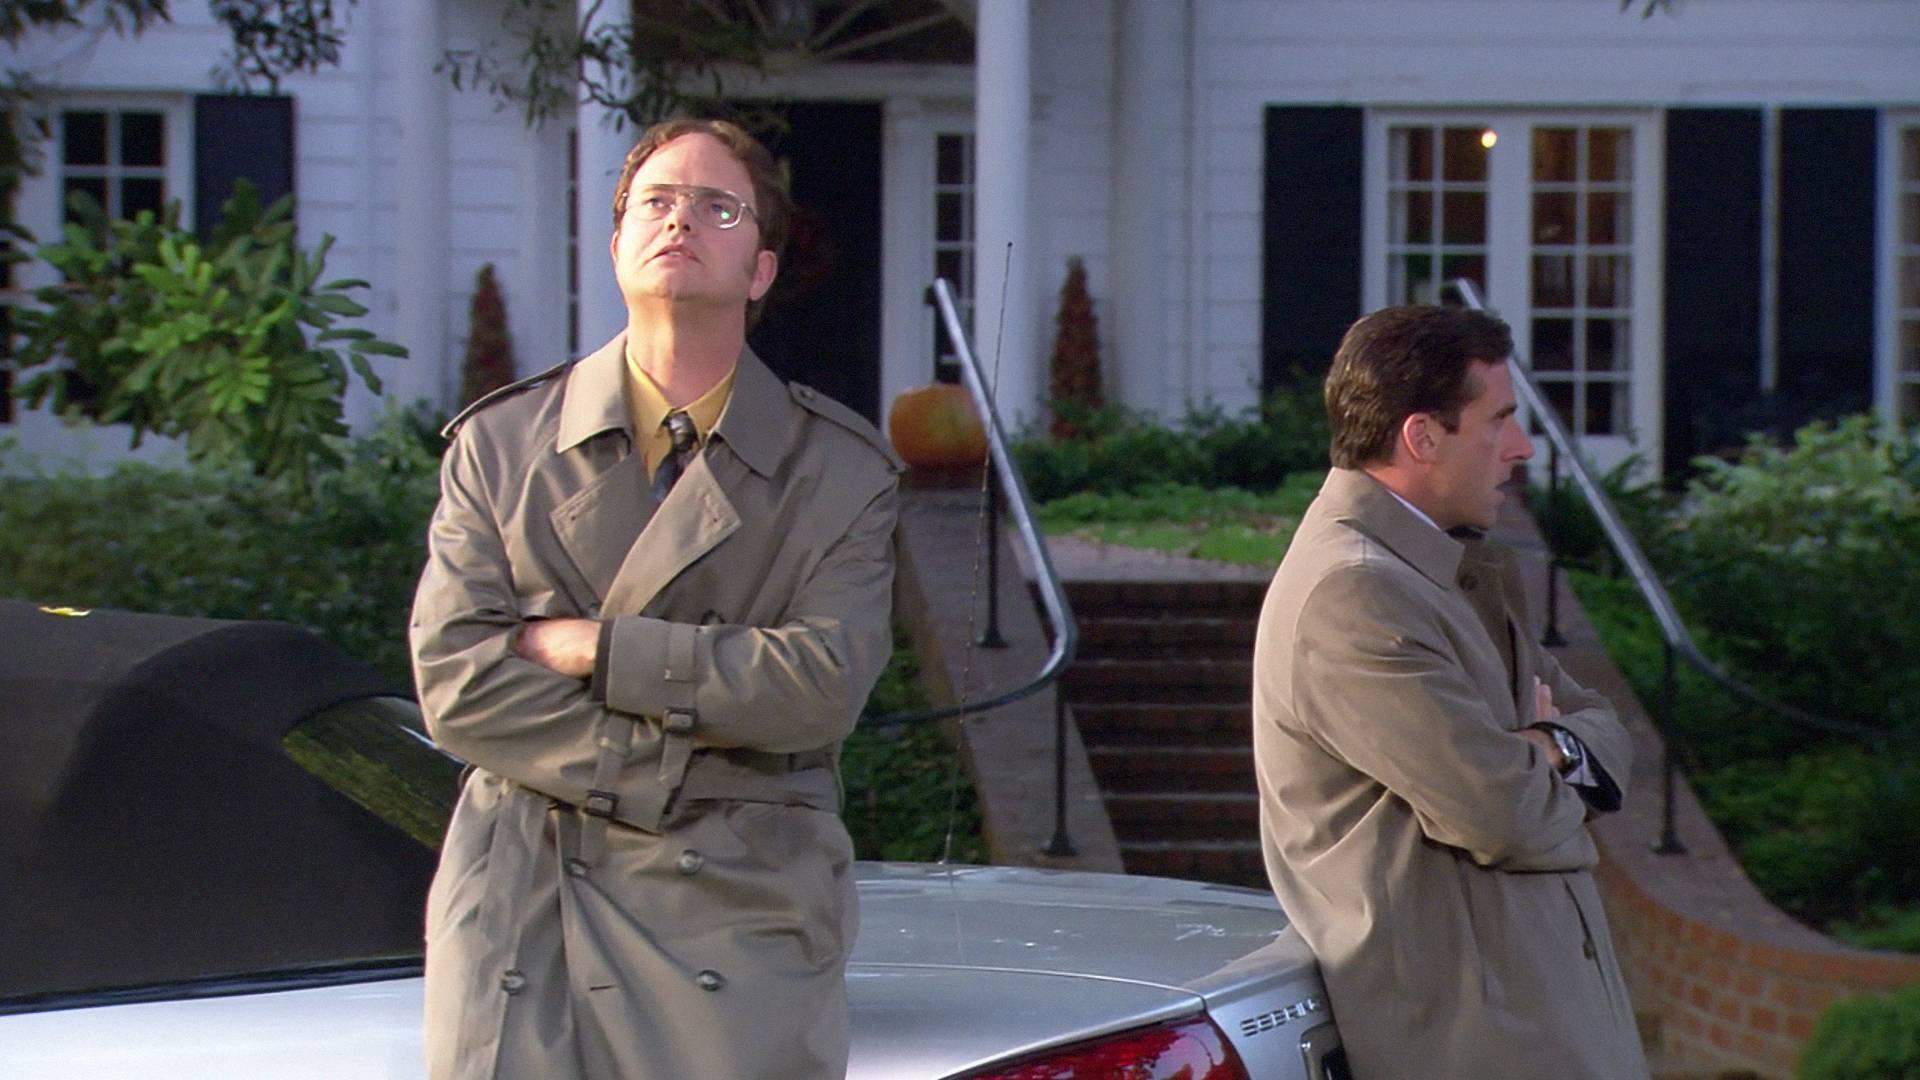 The Office Season 3 Episode 7